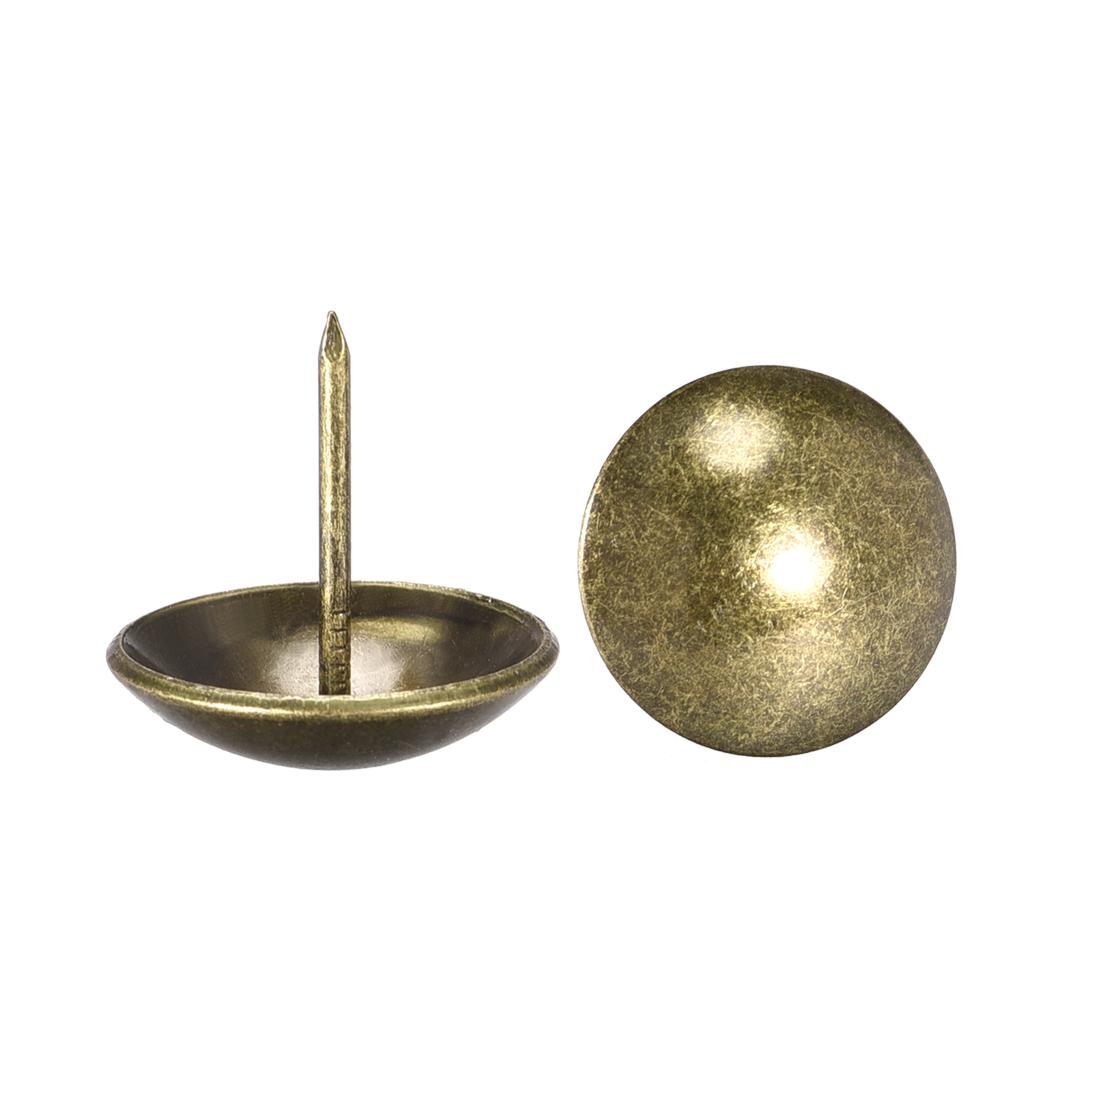 Upholstery Nails Tacks 25mm Dia 25mm Height Round Push Pins Bronze Tone 20 Pcs